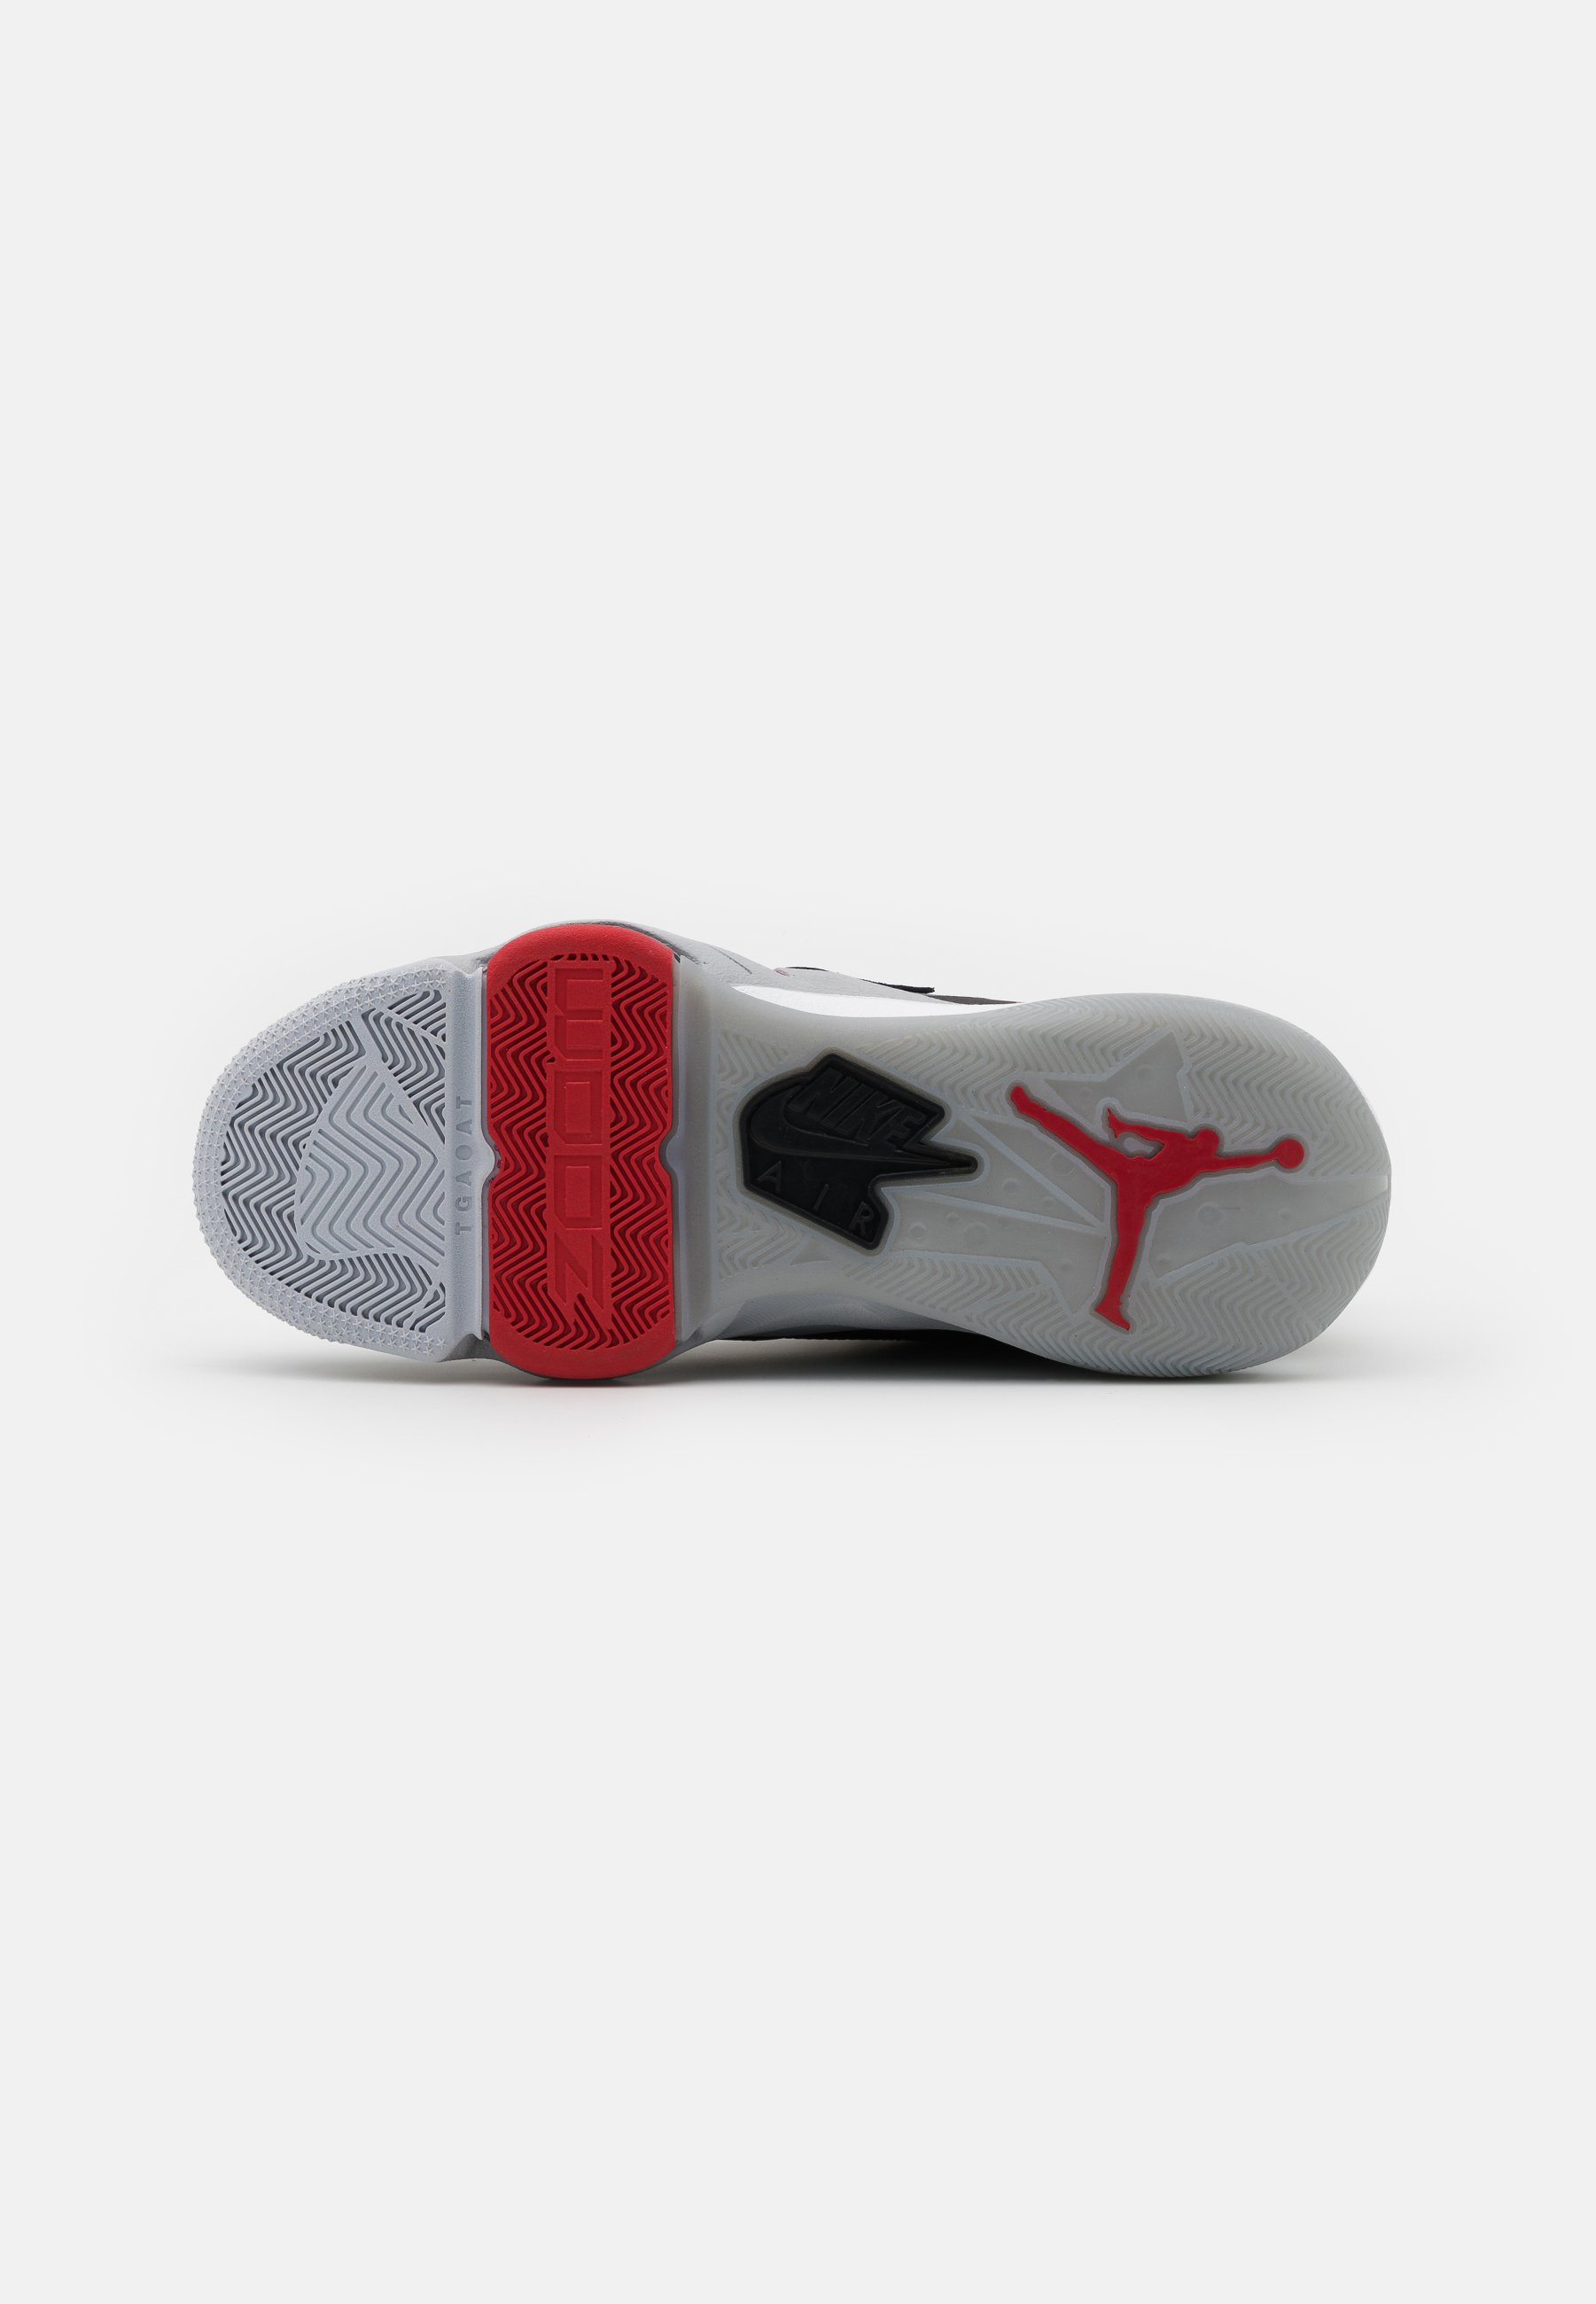 Meilleurs prix Jordan ZOOM '92 Baskets montantes anthracite/black/wolf grey/gym red/white/sky grey